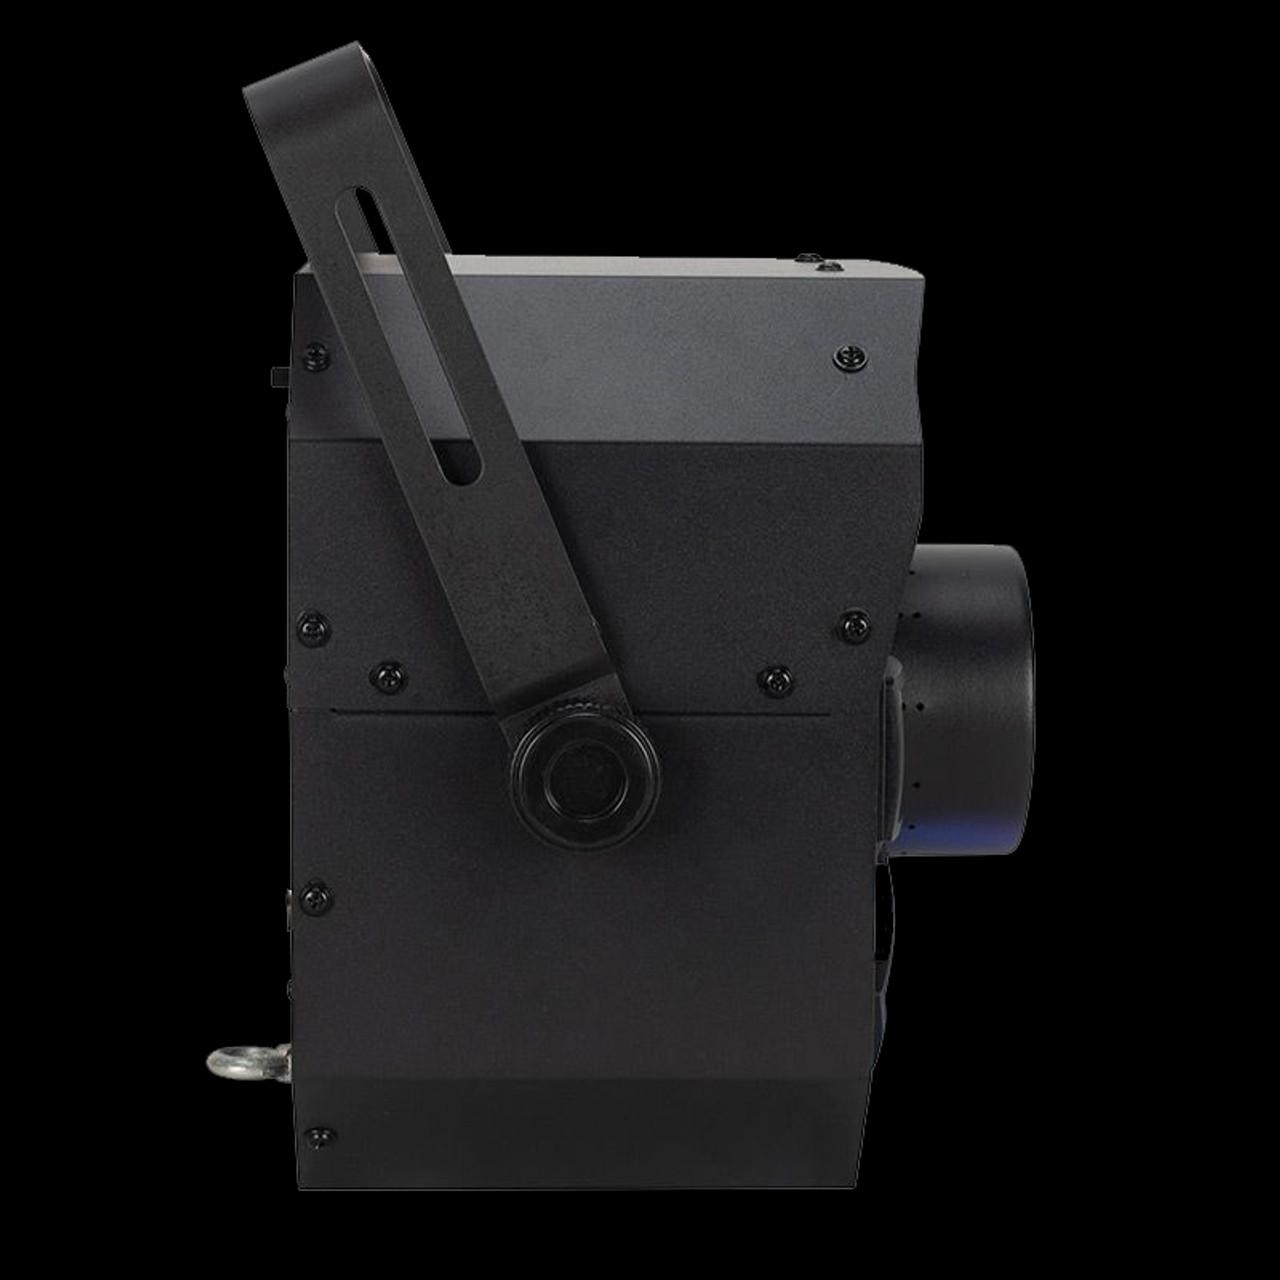 Eliminator Lighting Furious Three RG 3-FX-In-1 Moonflower / Wash + Laser DJ Light